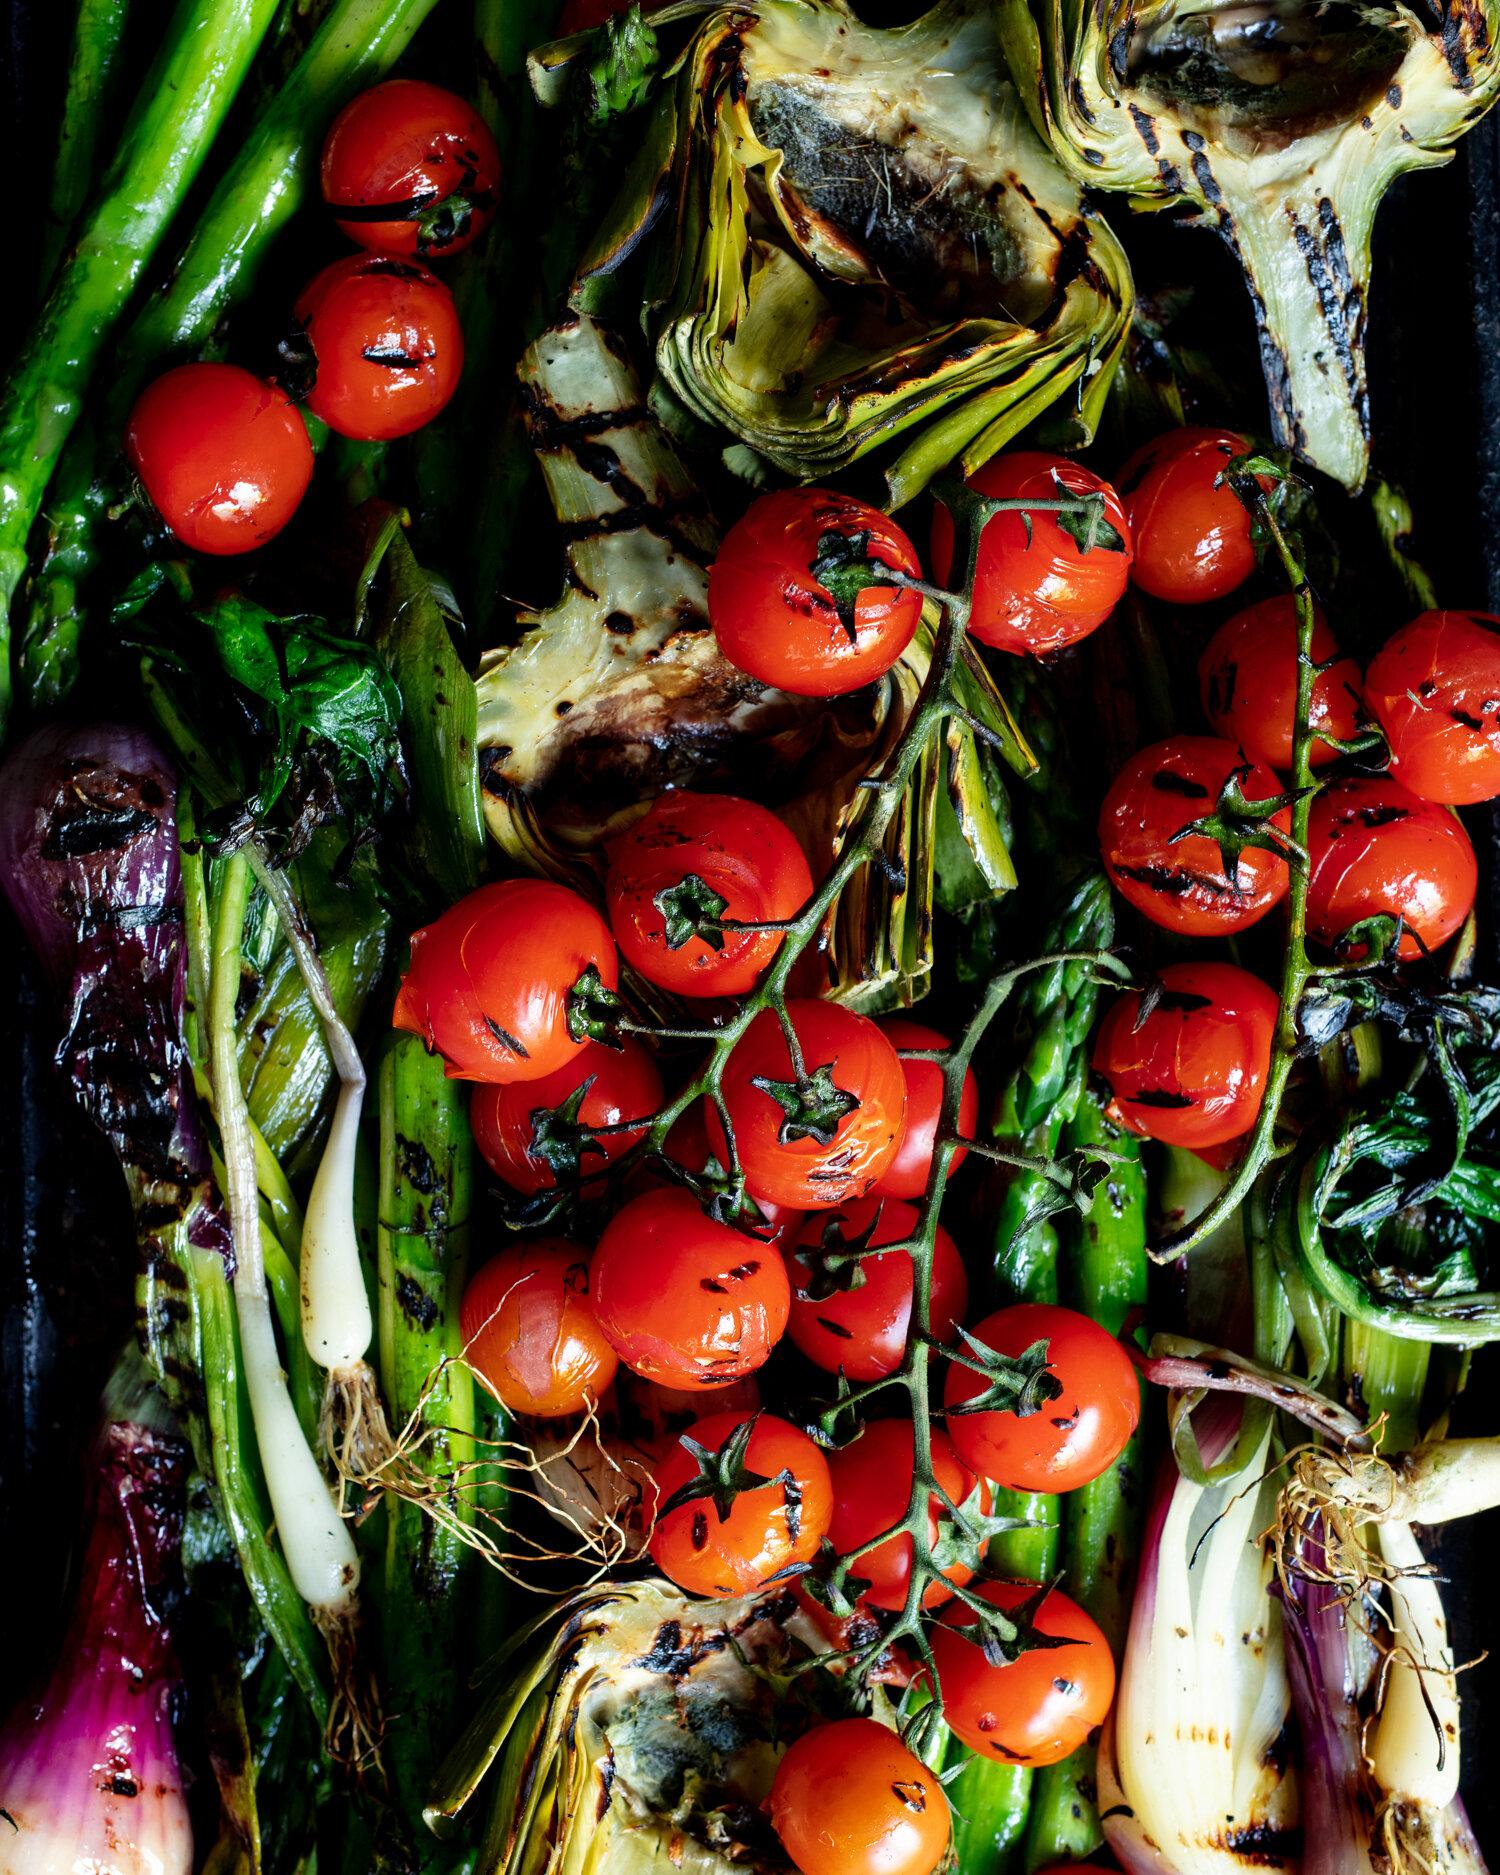 erin-scott_san-francisco-california-food-photographer-natural-light-editorial-grilled-veg-dark-georgedolese_may2019-1827.jpg